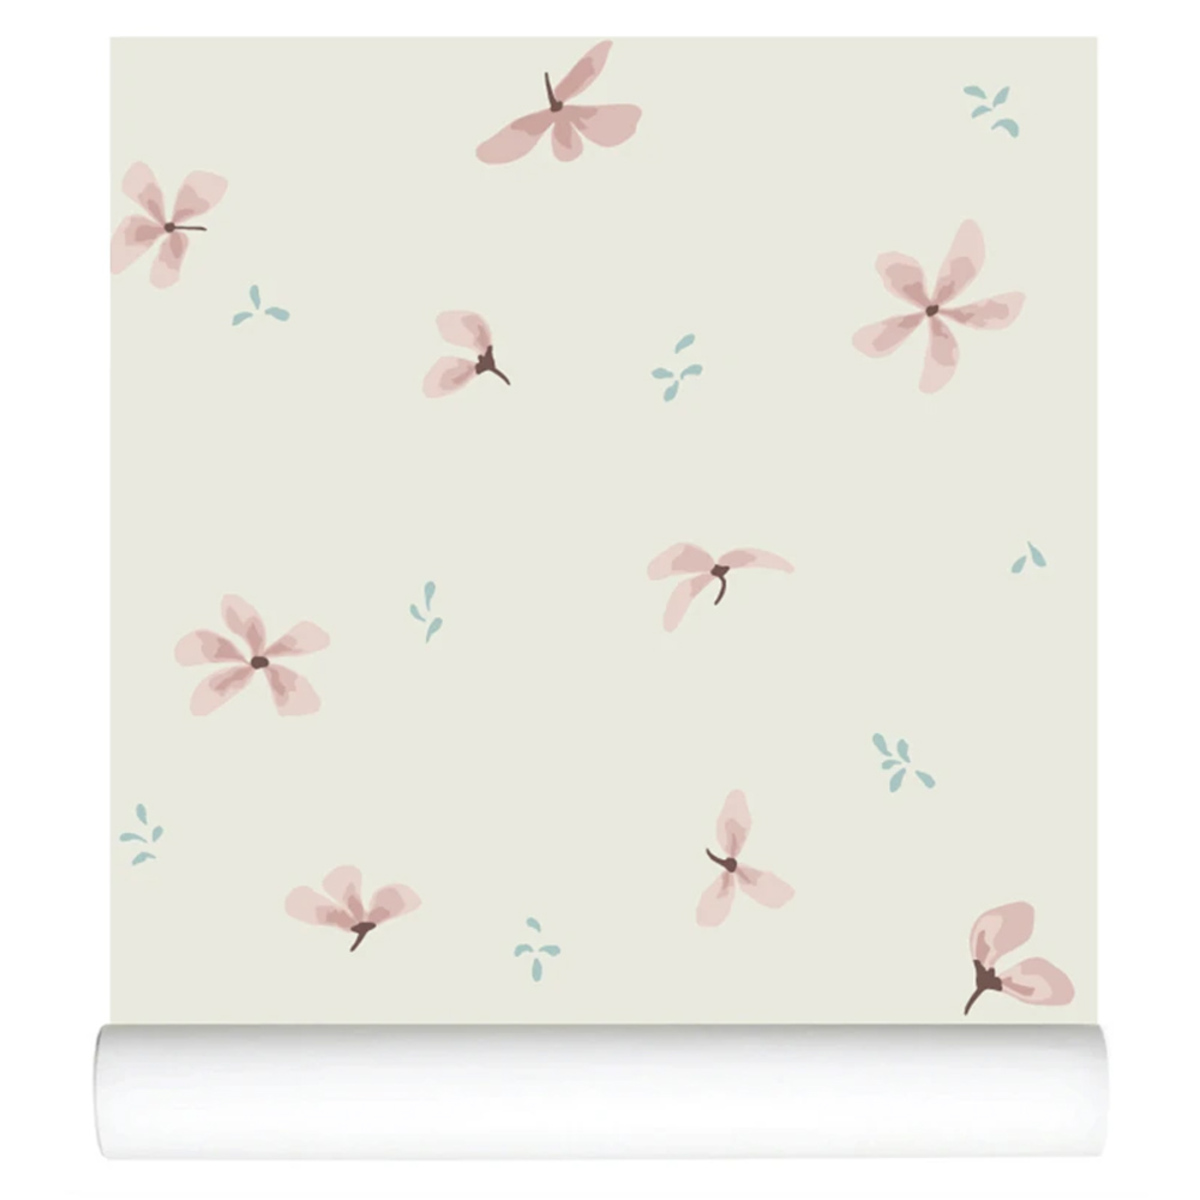 Papier peint Papier Peint - Windflower Cream Papier Peint - Windflower Cream